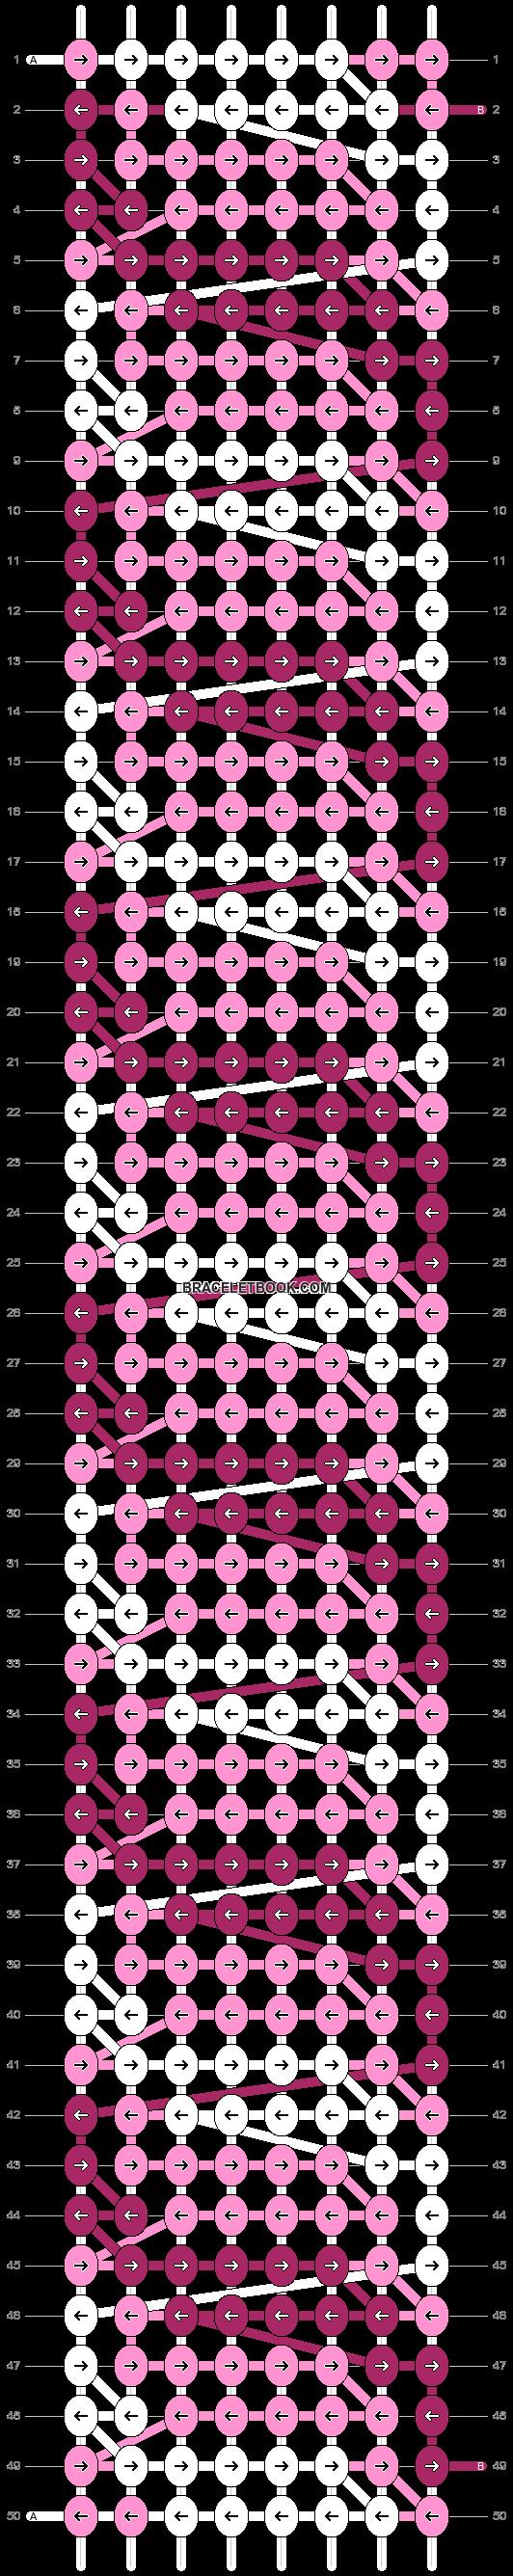 Alpha pattern #25313 pattern